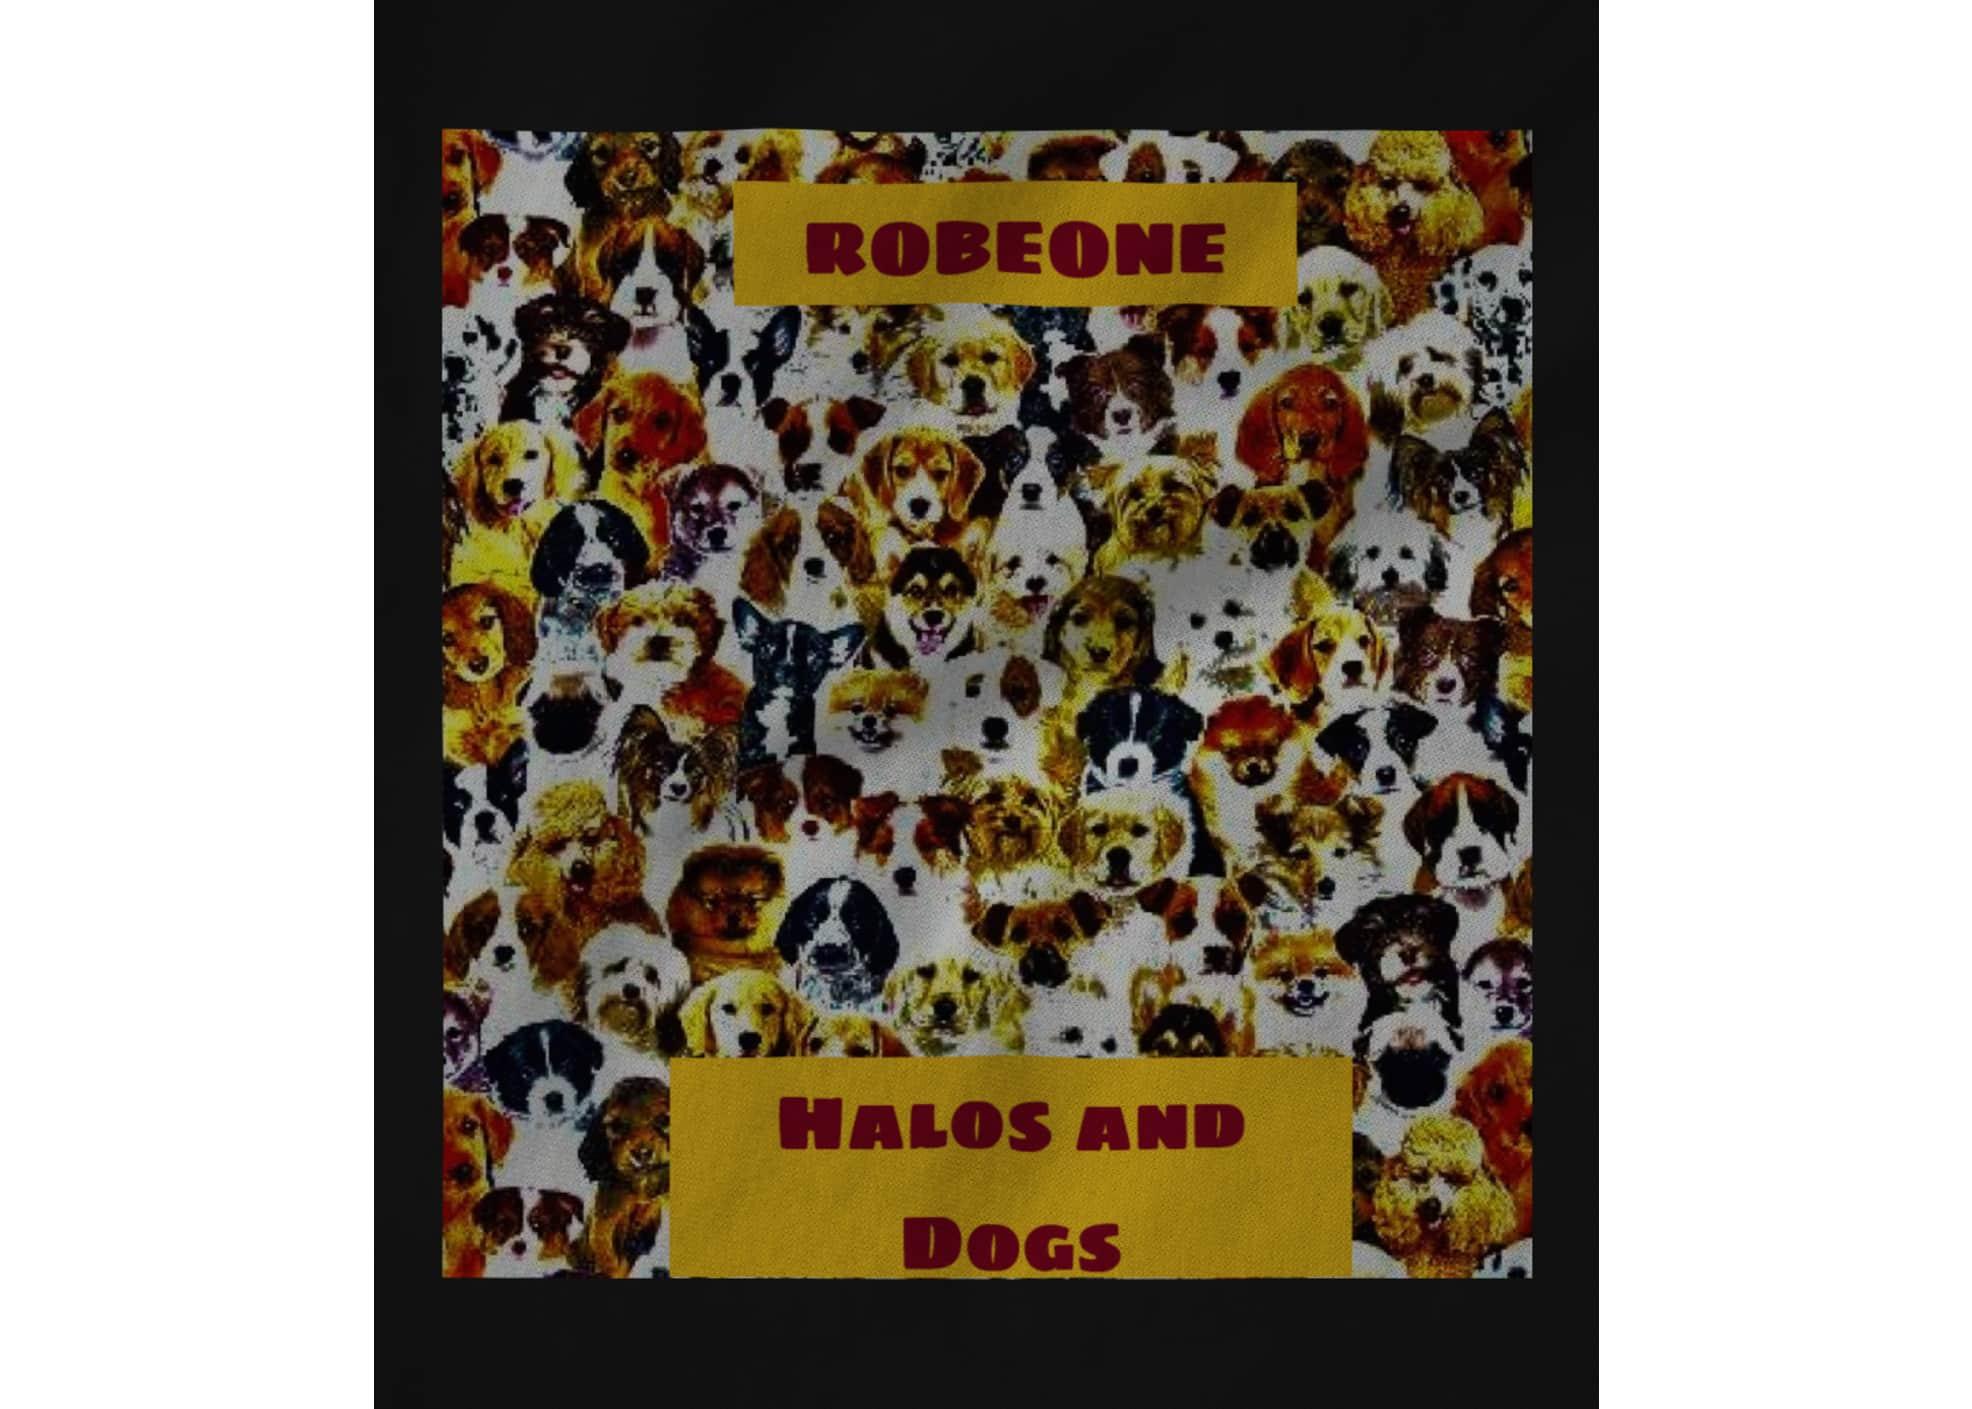 Robeone halos   dogs 1630346222